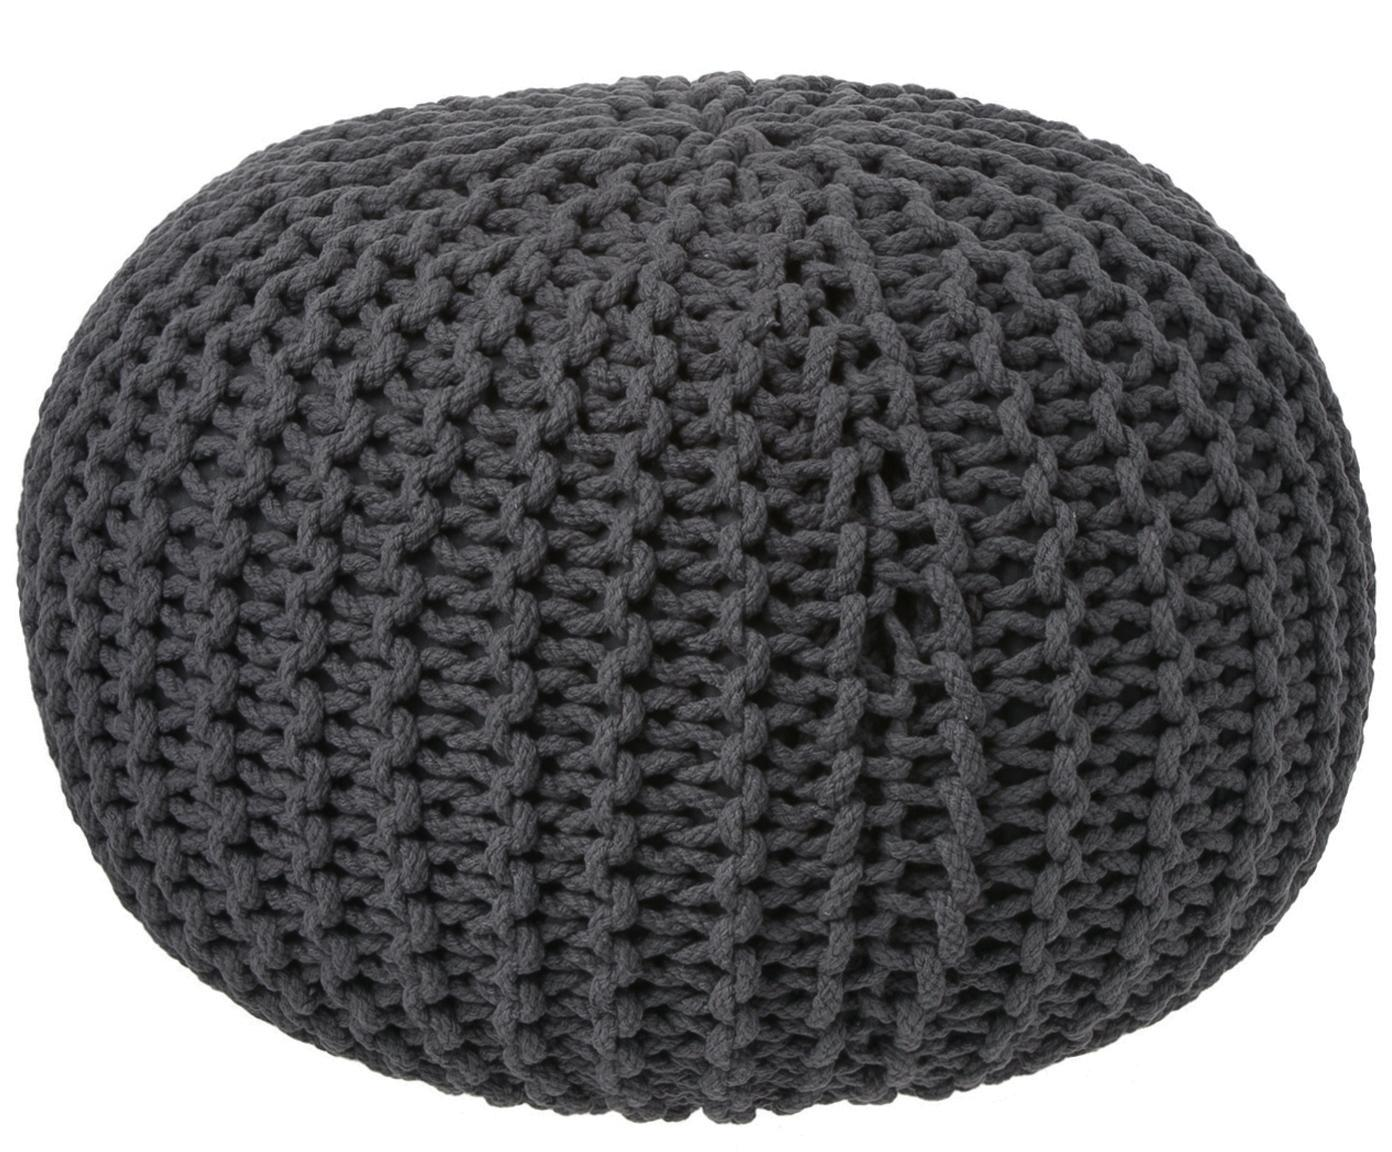 Handgefertigter Strickpouf Dori, Bezug: 100% Baumwolle, Dunkelgrau, Ø 55 x H 35 cm